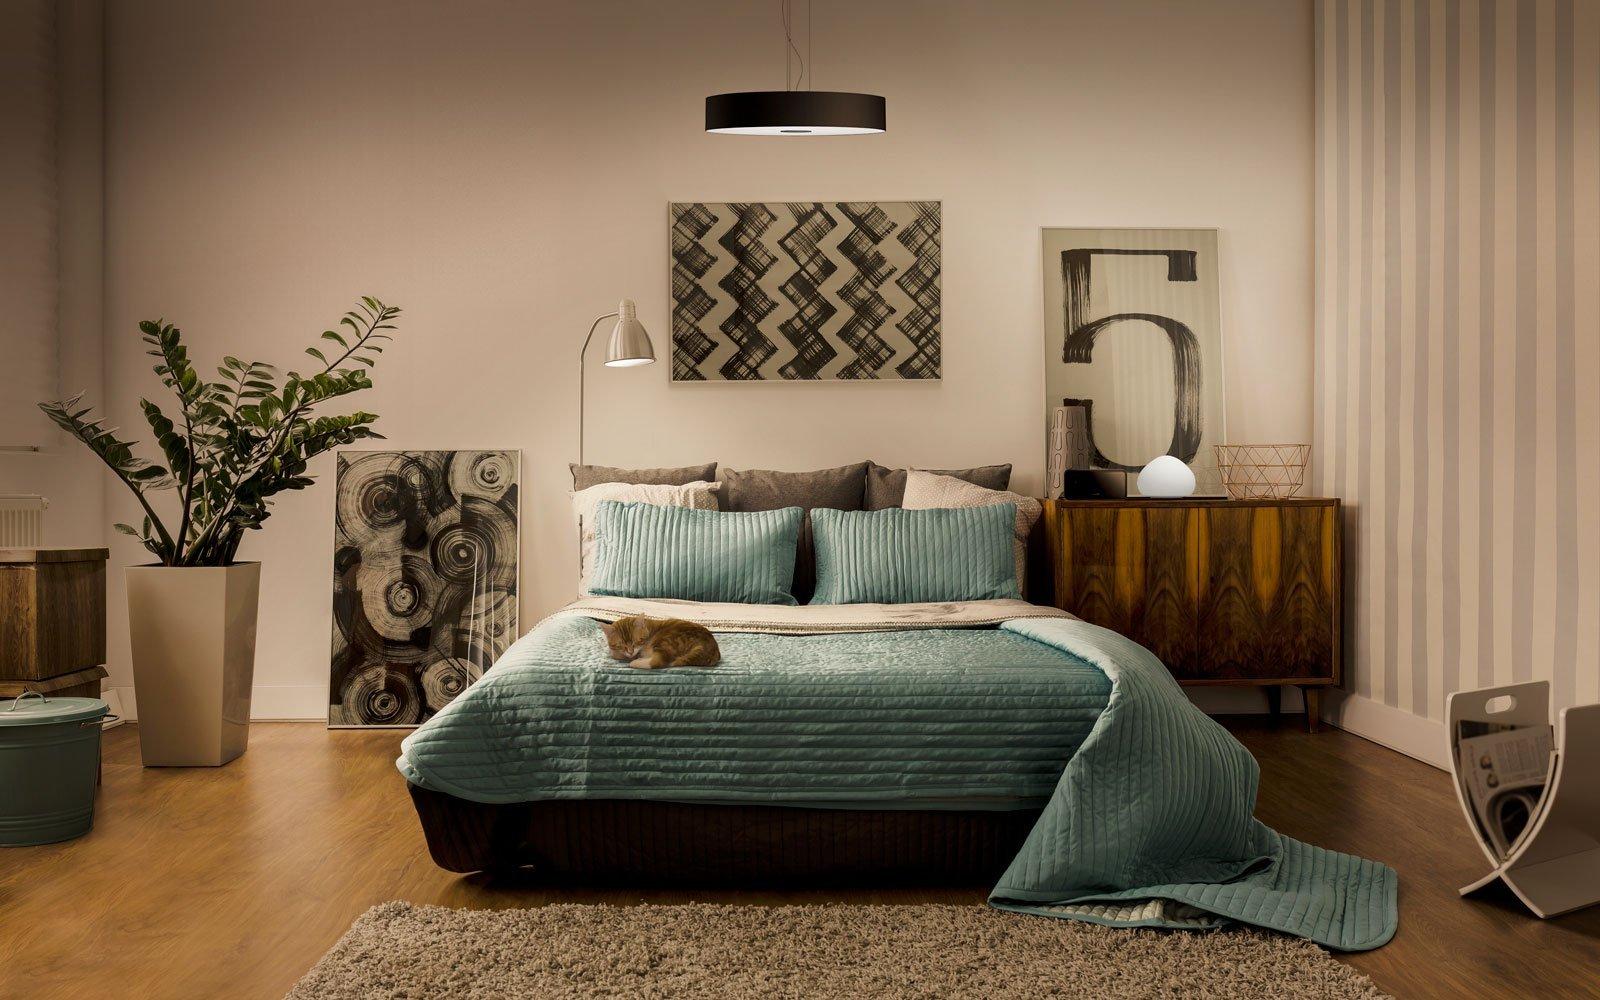 exciting bedroom lighting ideas | Bedroom Lighting Ideas - Meethue | Philips Hue